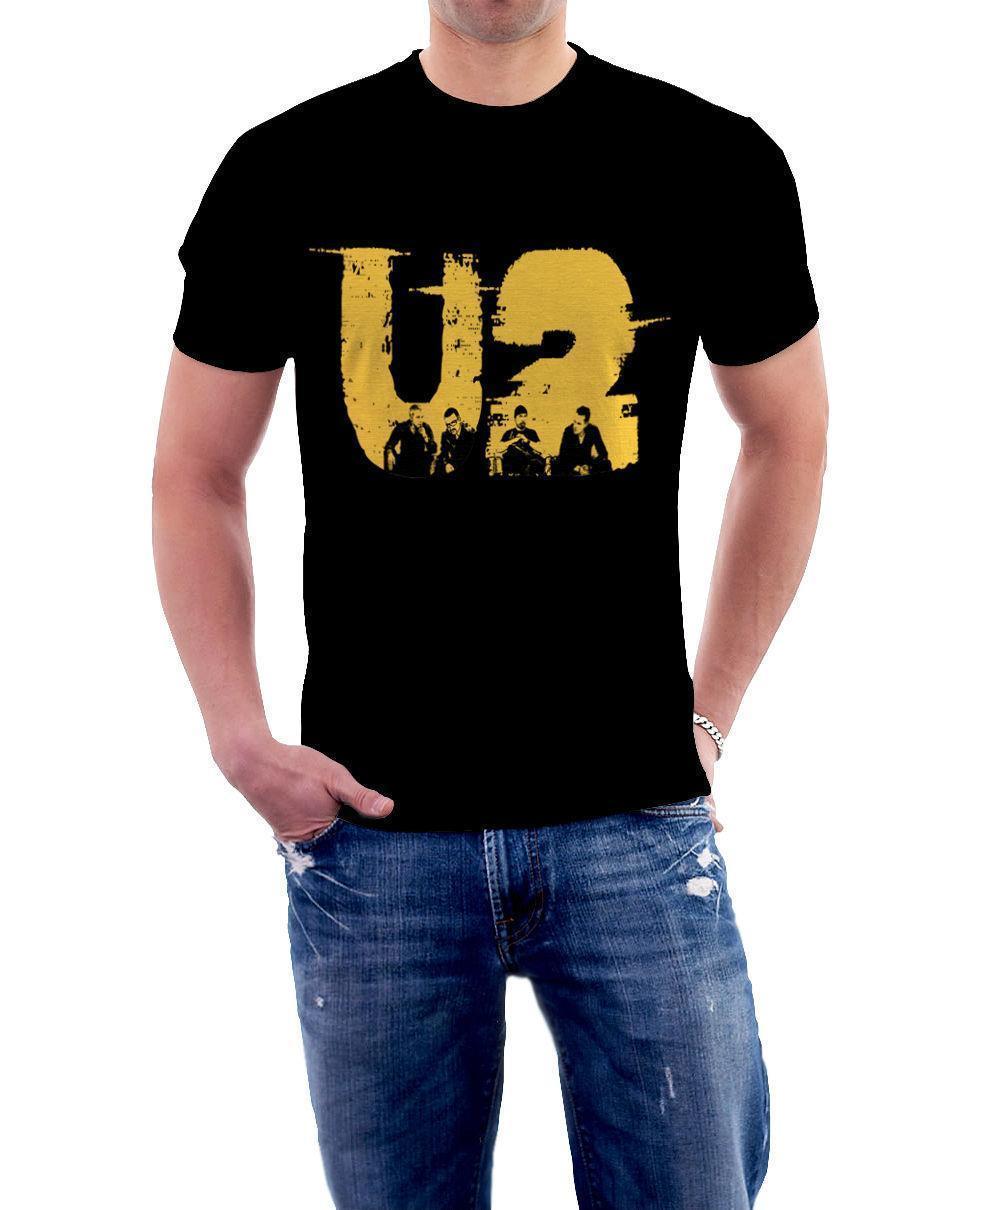 Compre 2018 Nueva Camiseta O Cuello Hombres U2 Rock Band Póster Diseño  Impreso Manga Corta Camisetas A  12.08 Del Lijian85  9e845e58dfd1d